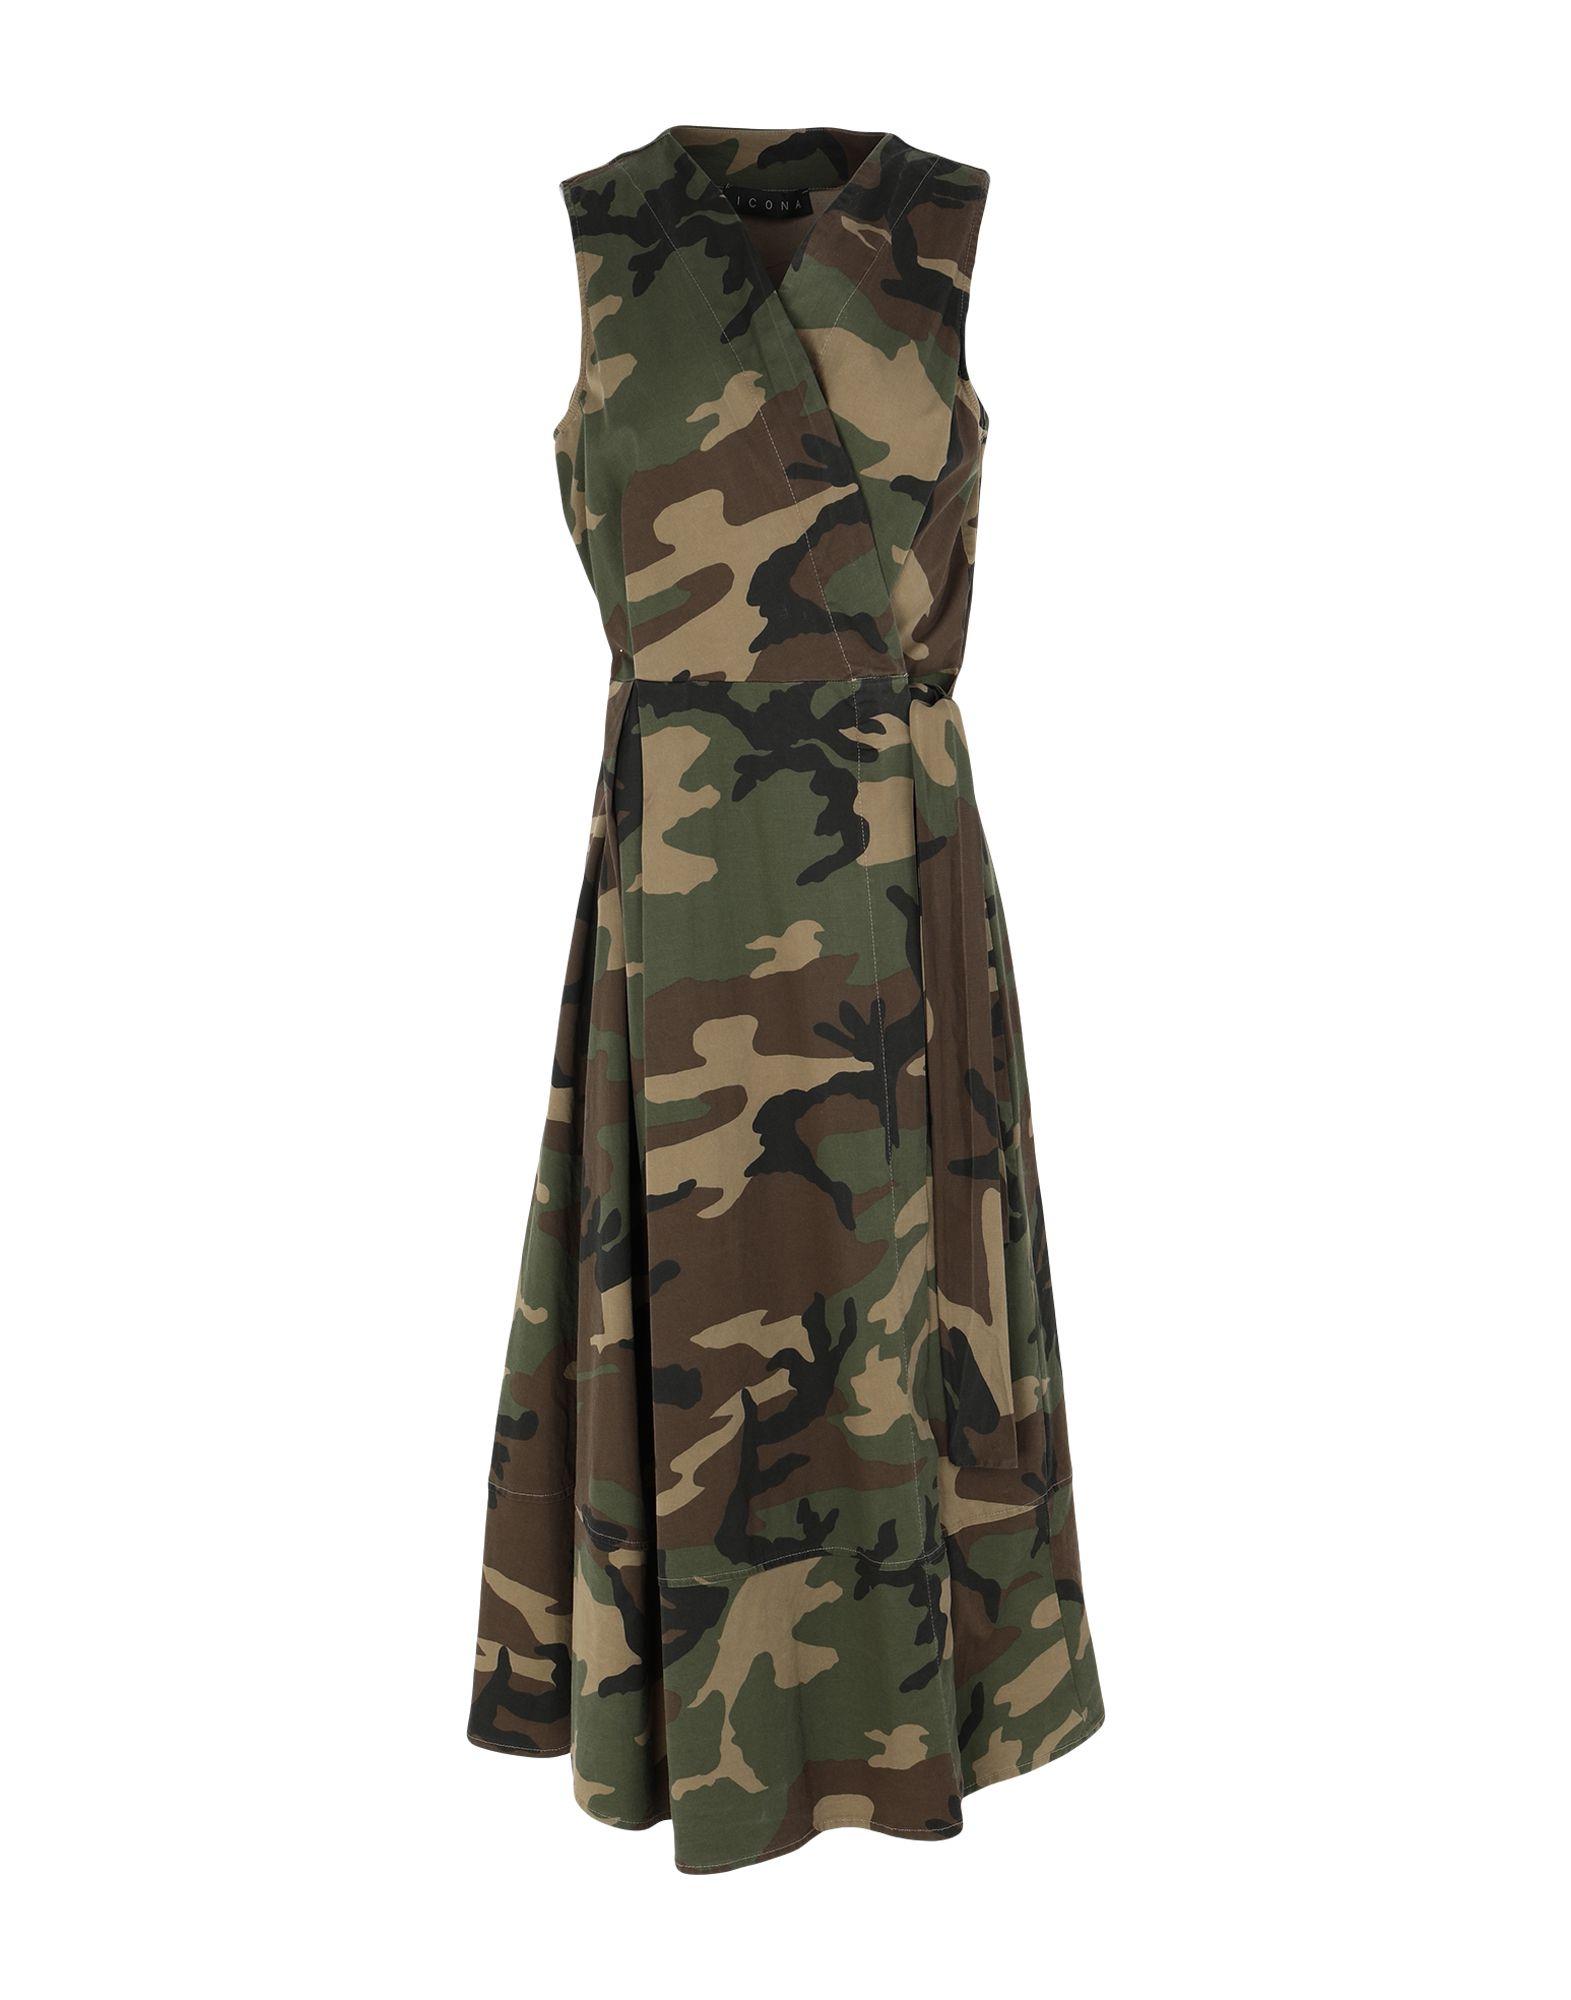 ICONA by KAOS Платье длиной 3/4 icona by kaos короткое платье